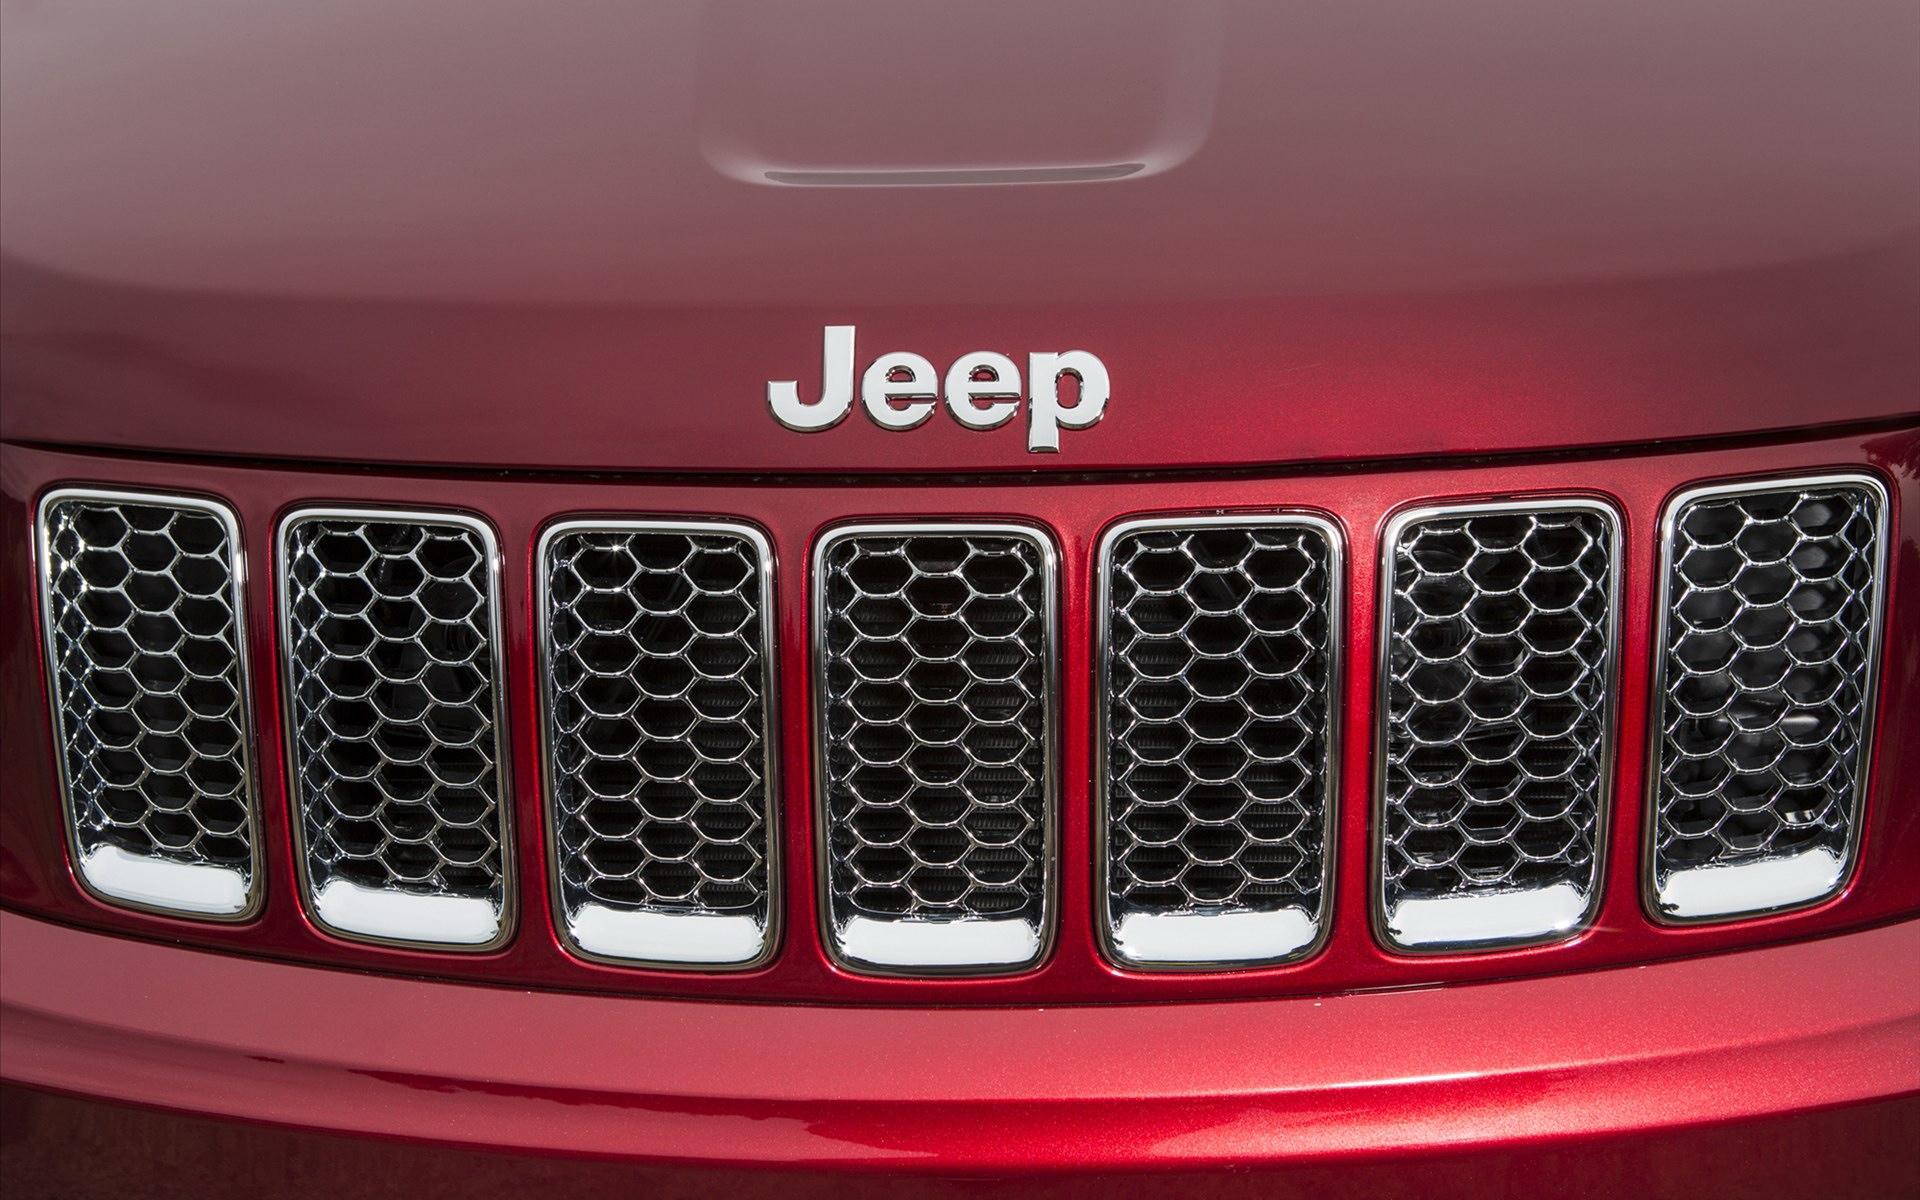 jeep grand cherokee 2014 吉普大切诺基 高清图片